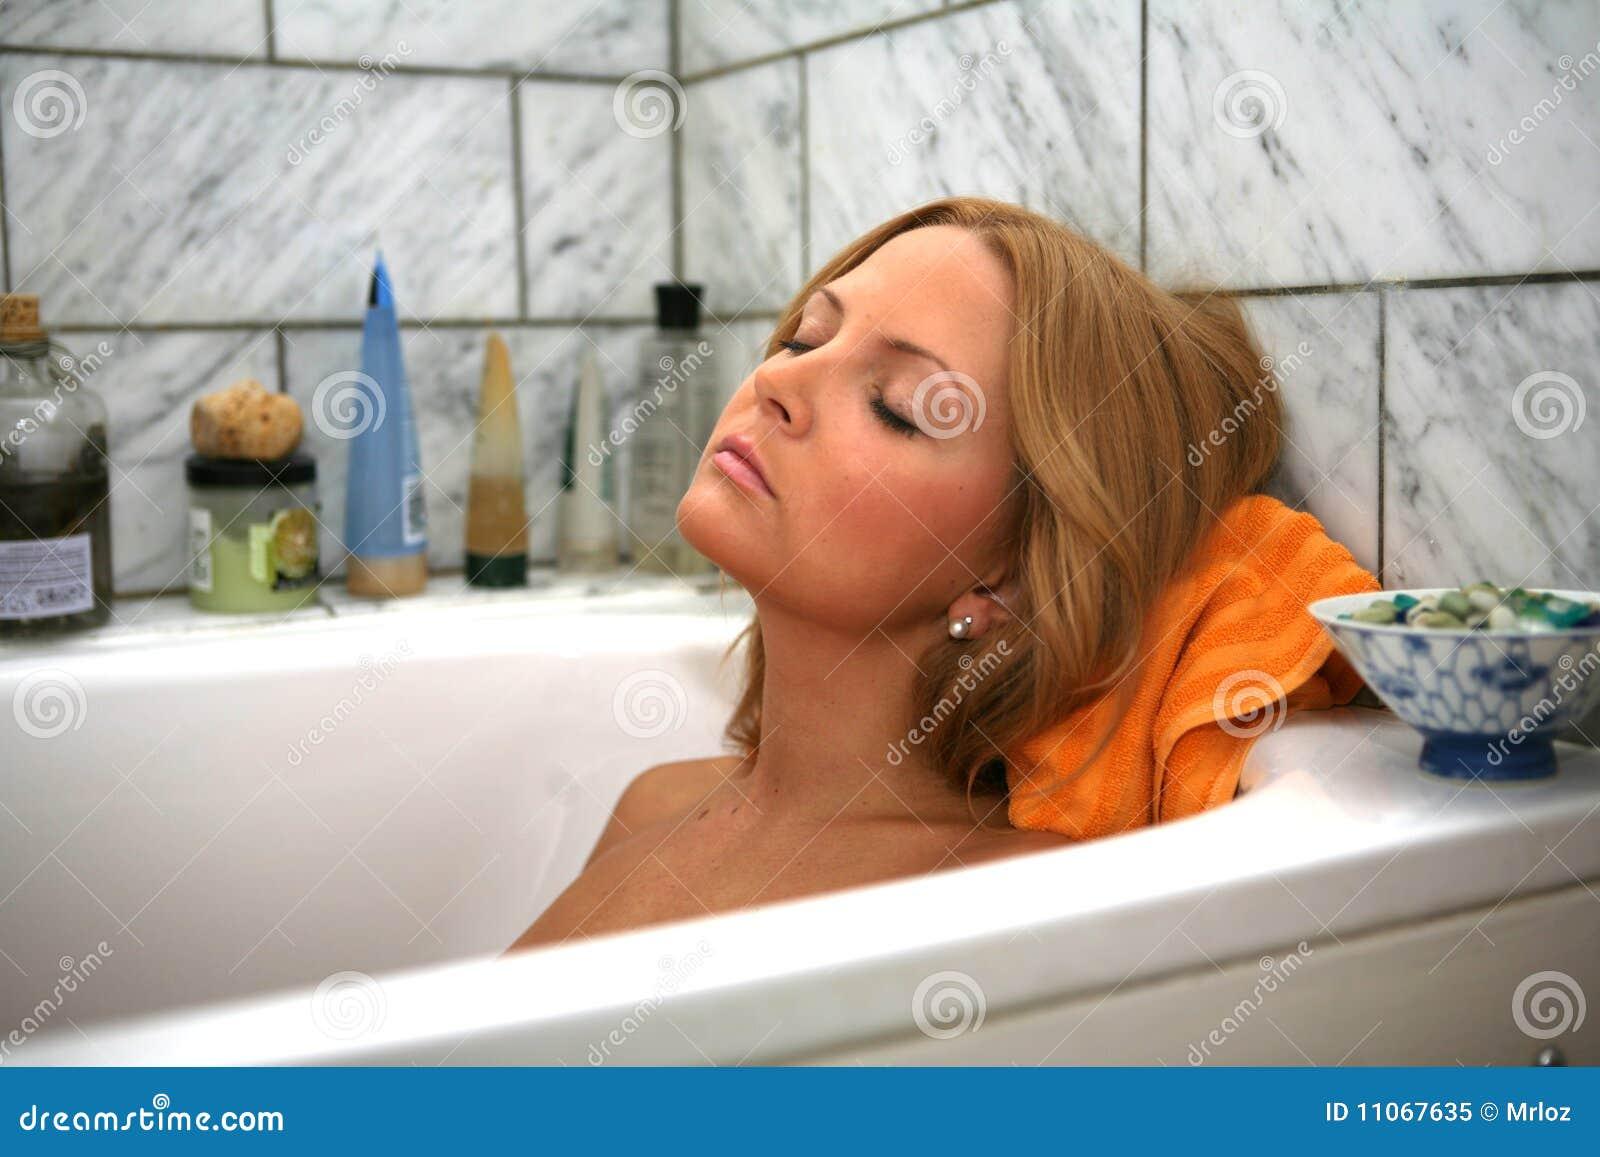 Sleeping in the Bath